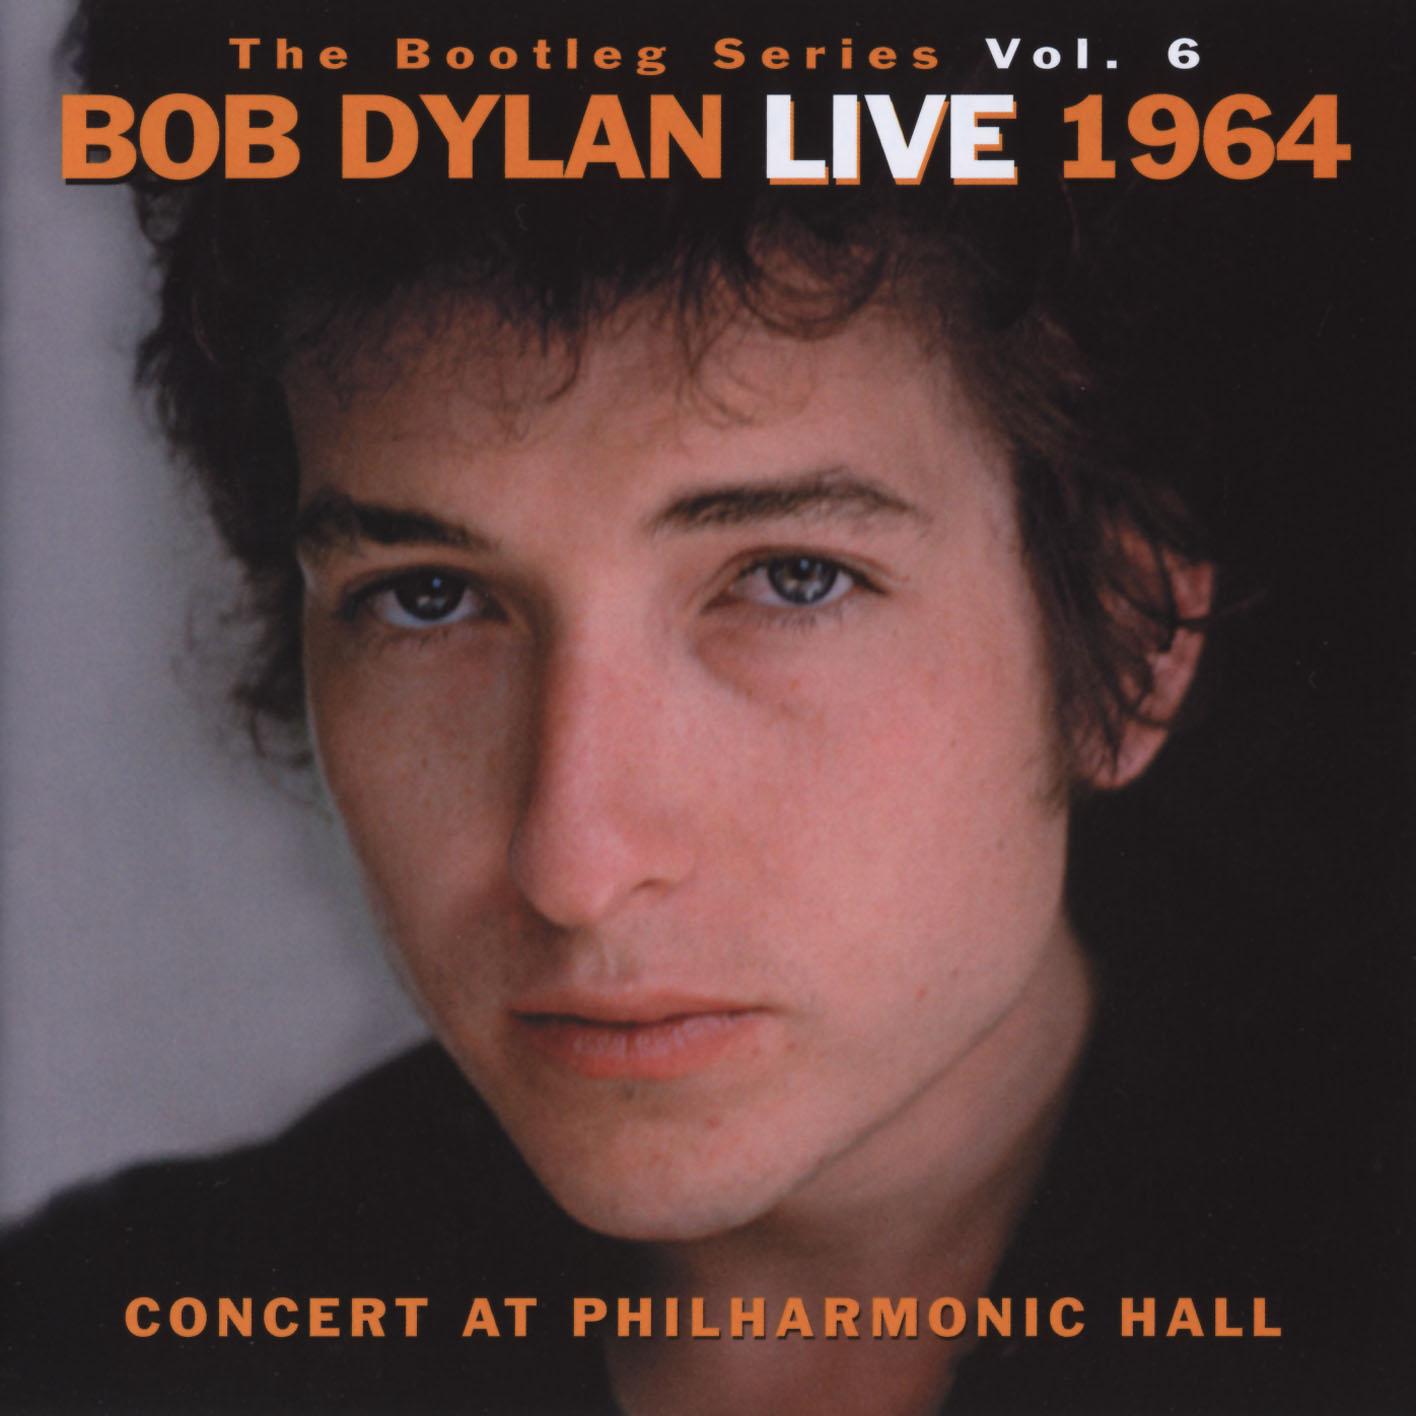 The Bootleg Volume 6: Bob Dylan Live 1964 – Concert At Philharmonic Hall